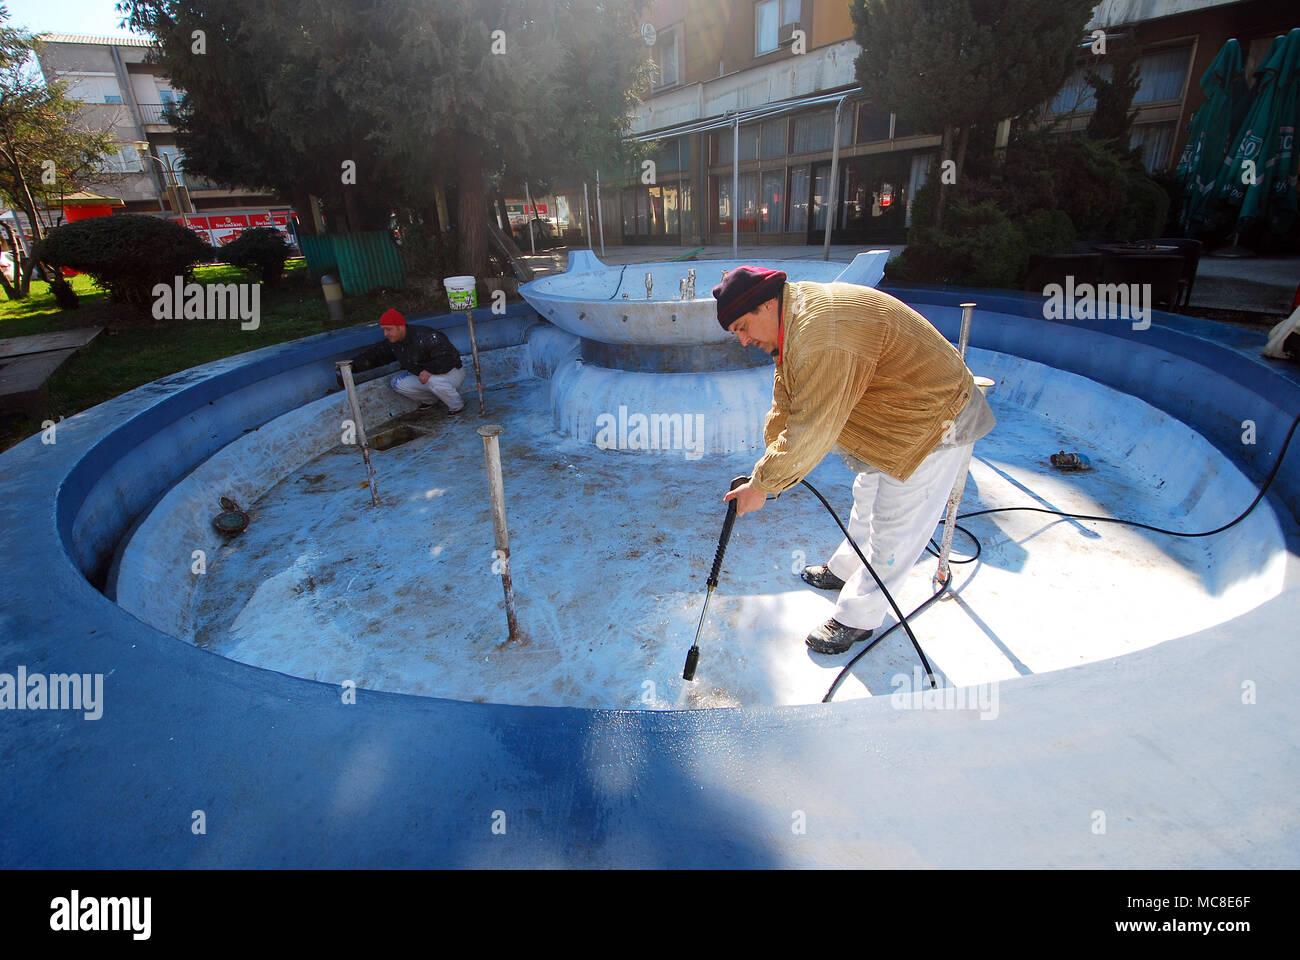 Inwardly Stockfotos & Inwardly Bilder - Alamy